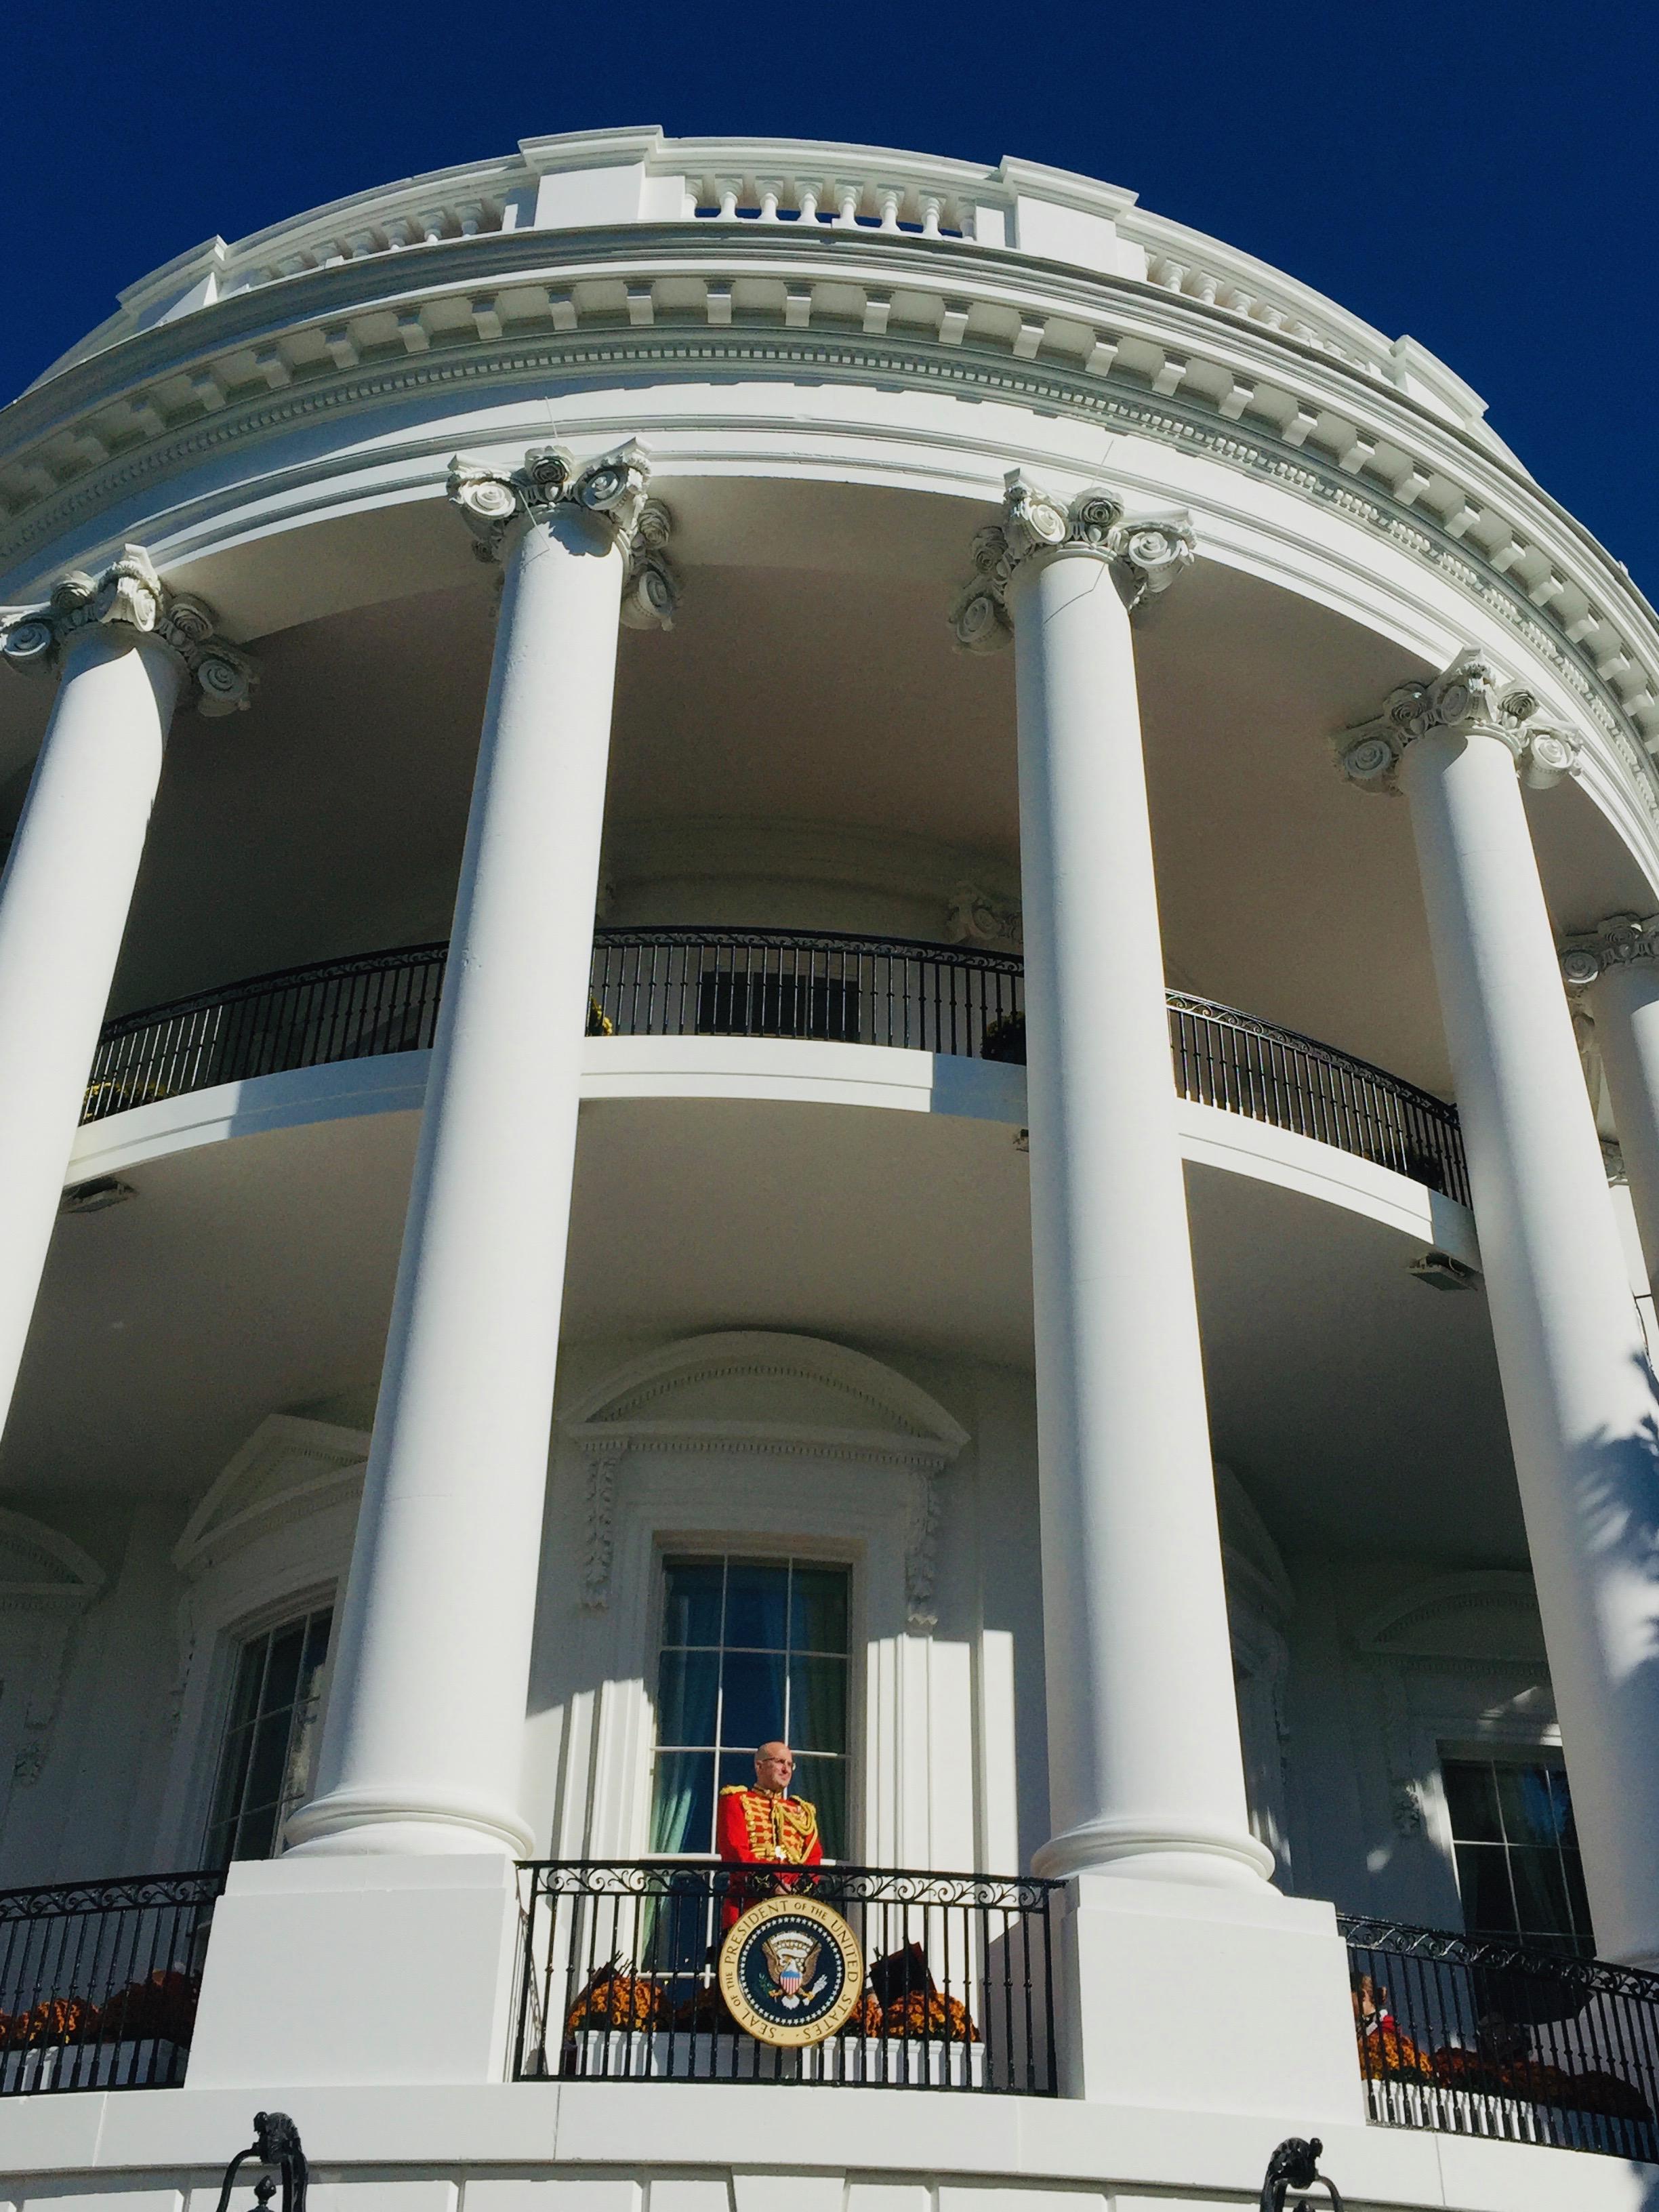 Band on White House balcony.